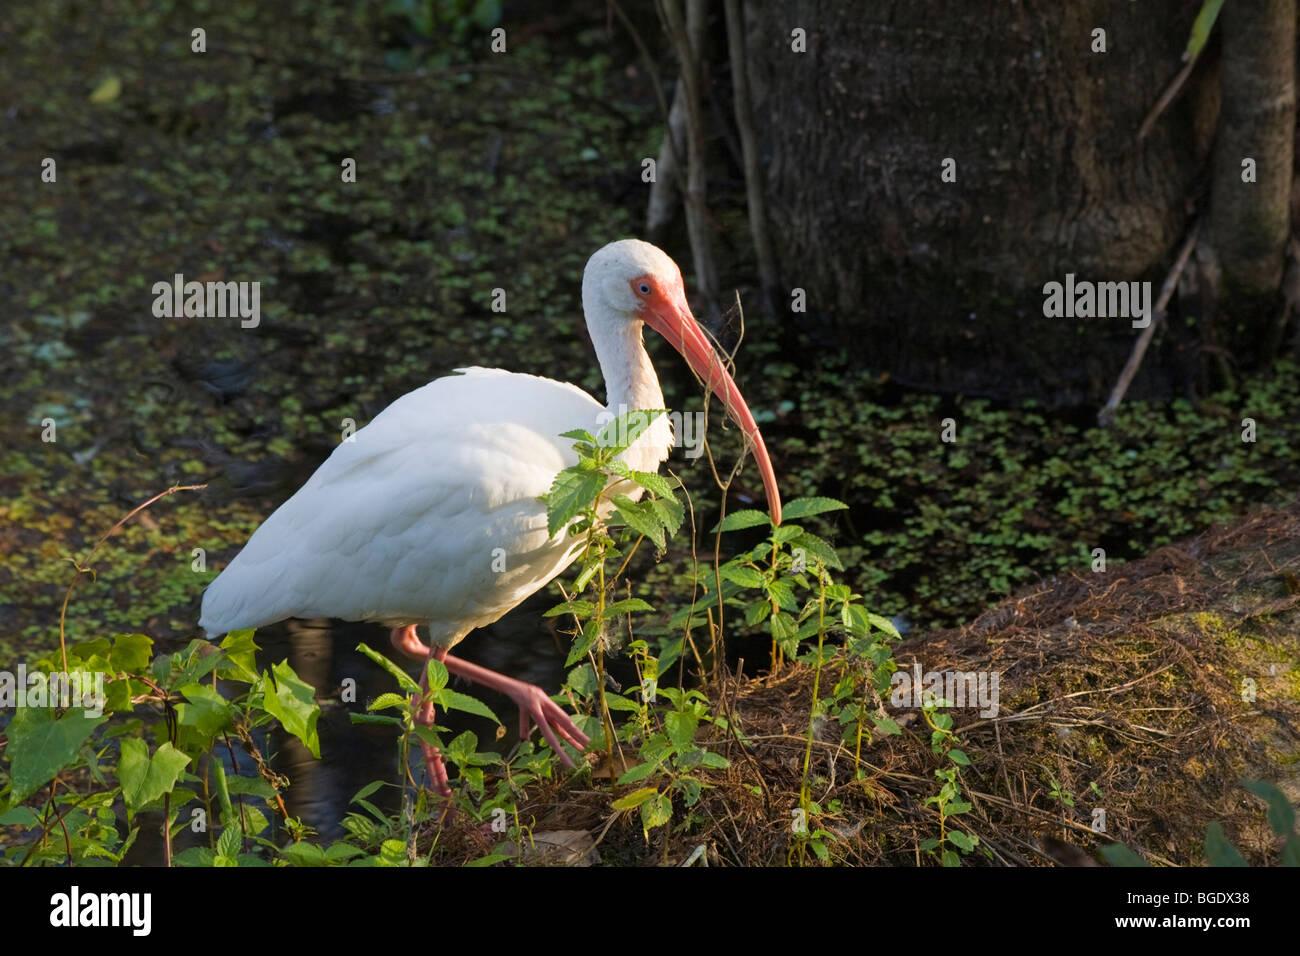 White Ibis in J N Ding Darling National Wildlife Preserve on Sanibel Island Florida - Stock Image